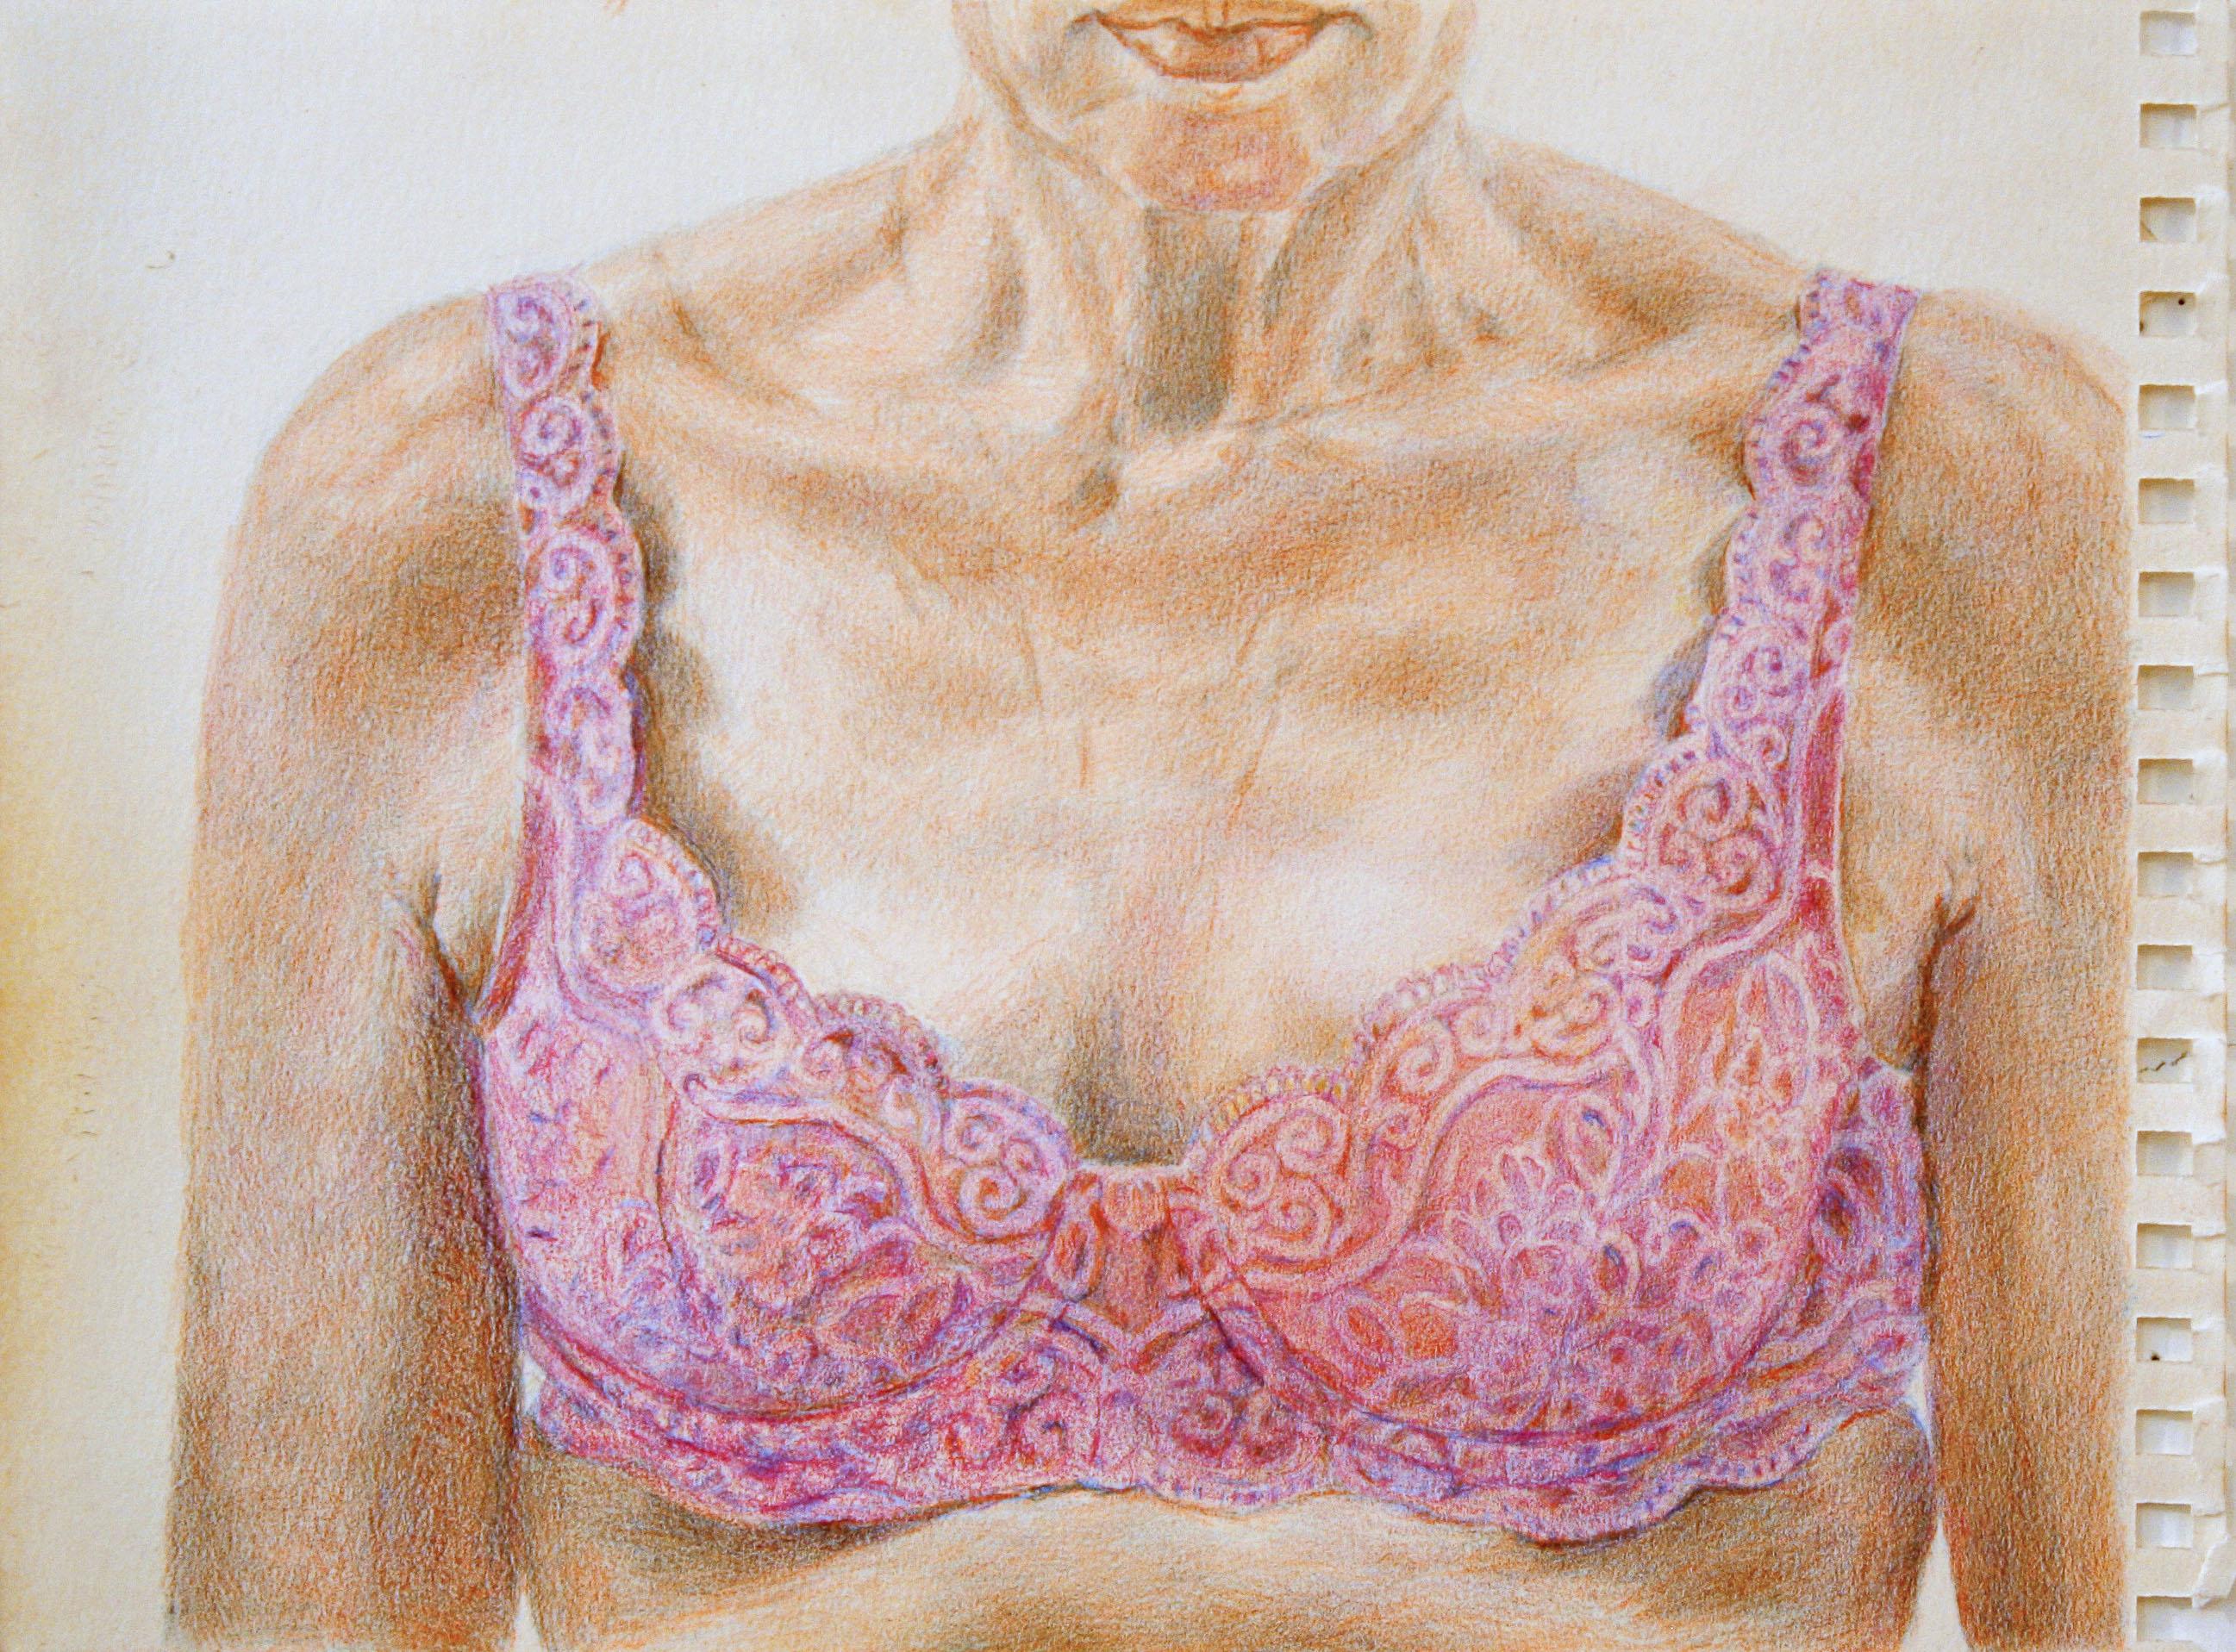 pink bra